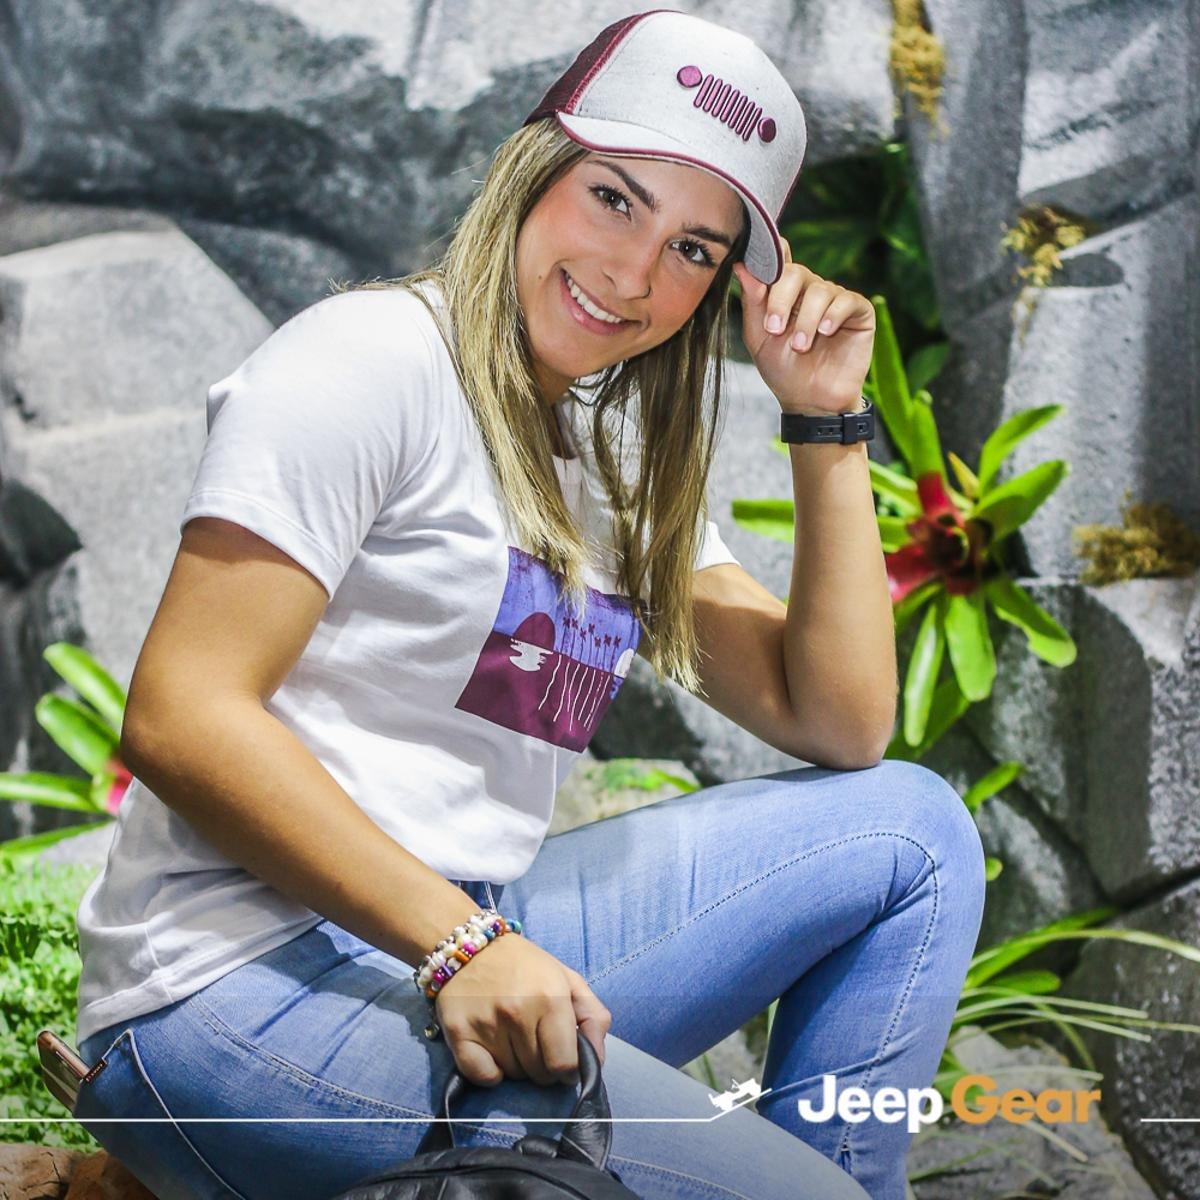 acaddadf75 Camiseta JEEP Renegade View Feminina - Branco - Compre Agora